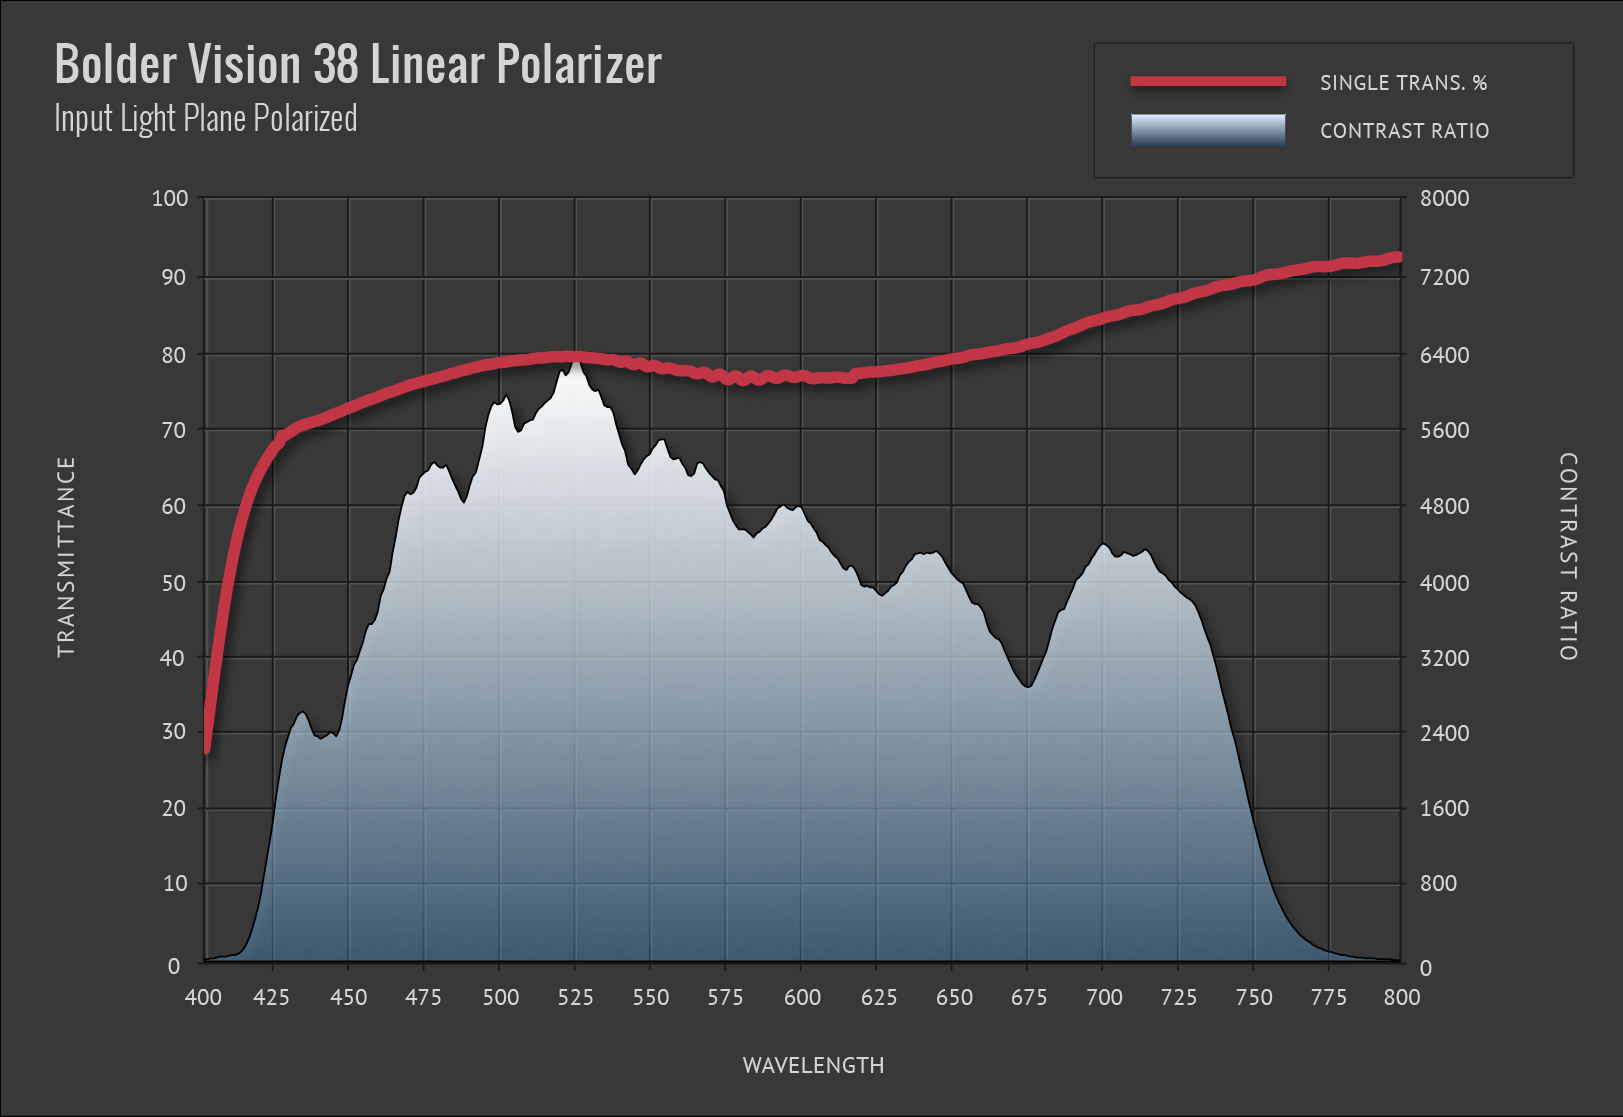 Bolder Vision 38 Linear Polarizer